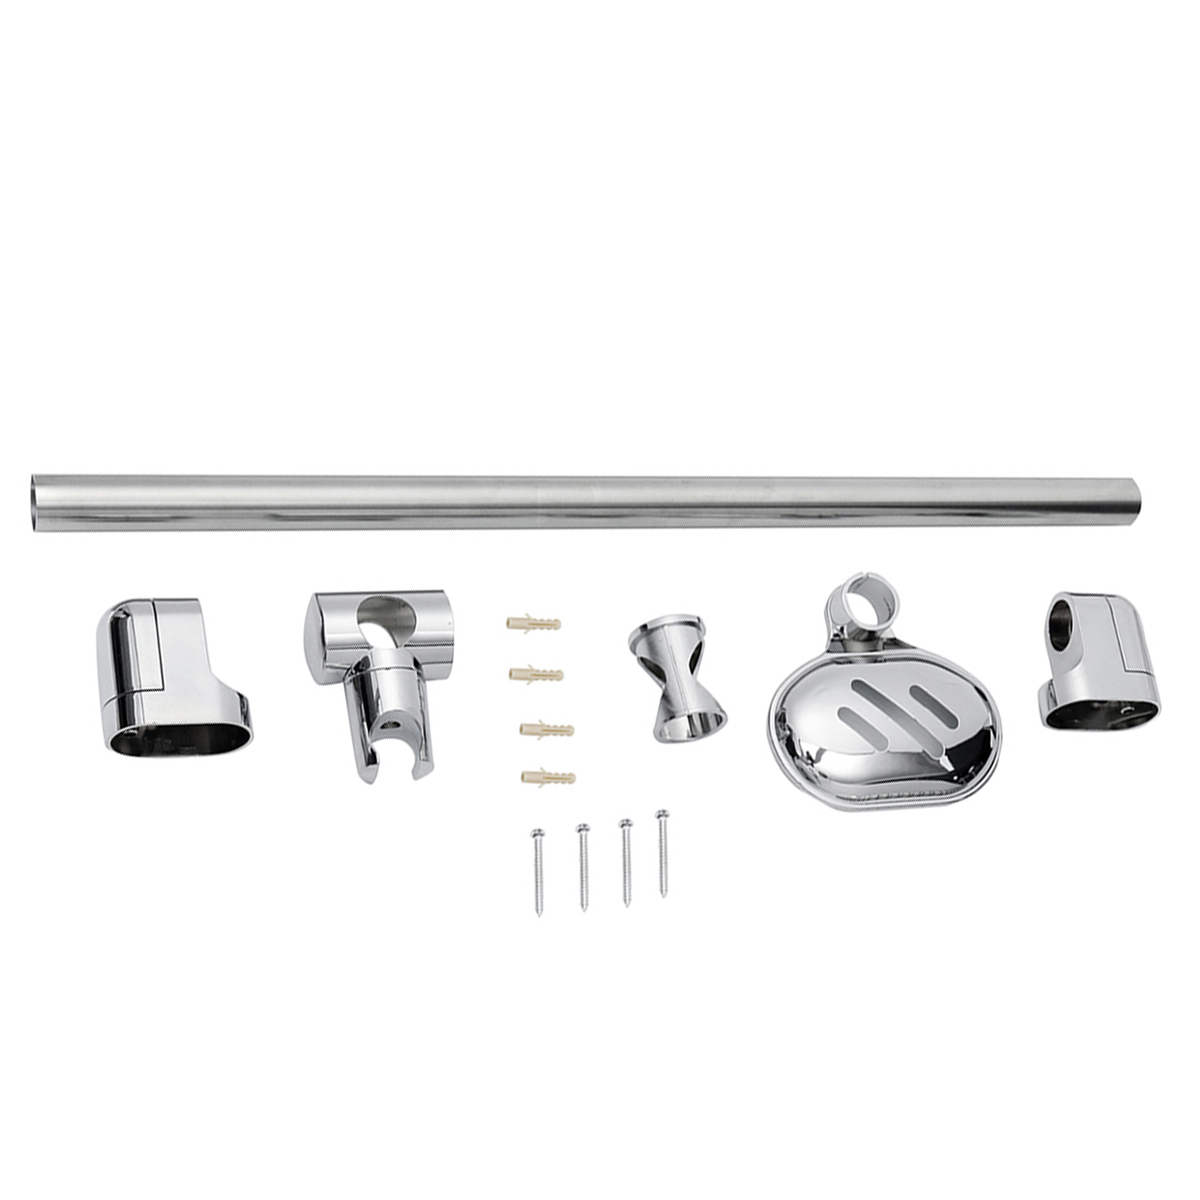 Stainless Steel Adjustable Riser Rail Bar Shower Stand Soap Stand Shower Head Towel Holder 610mm